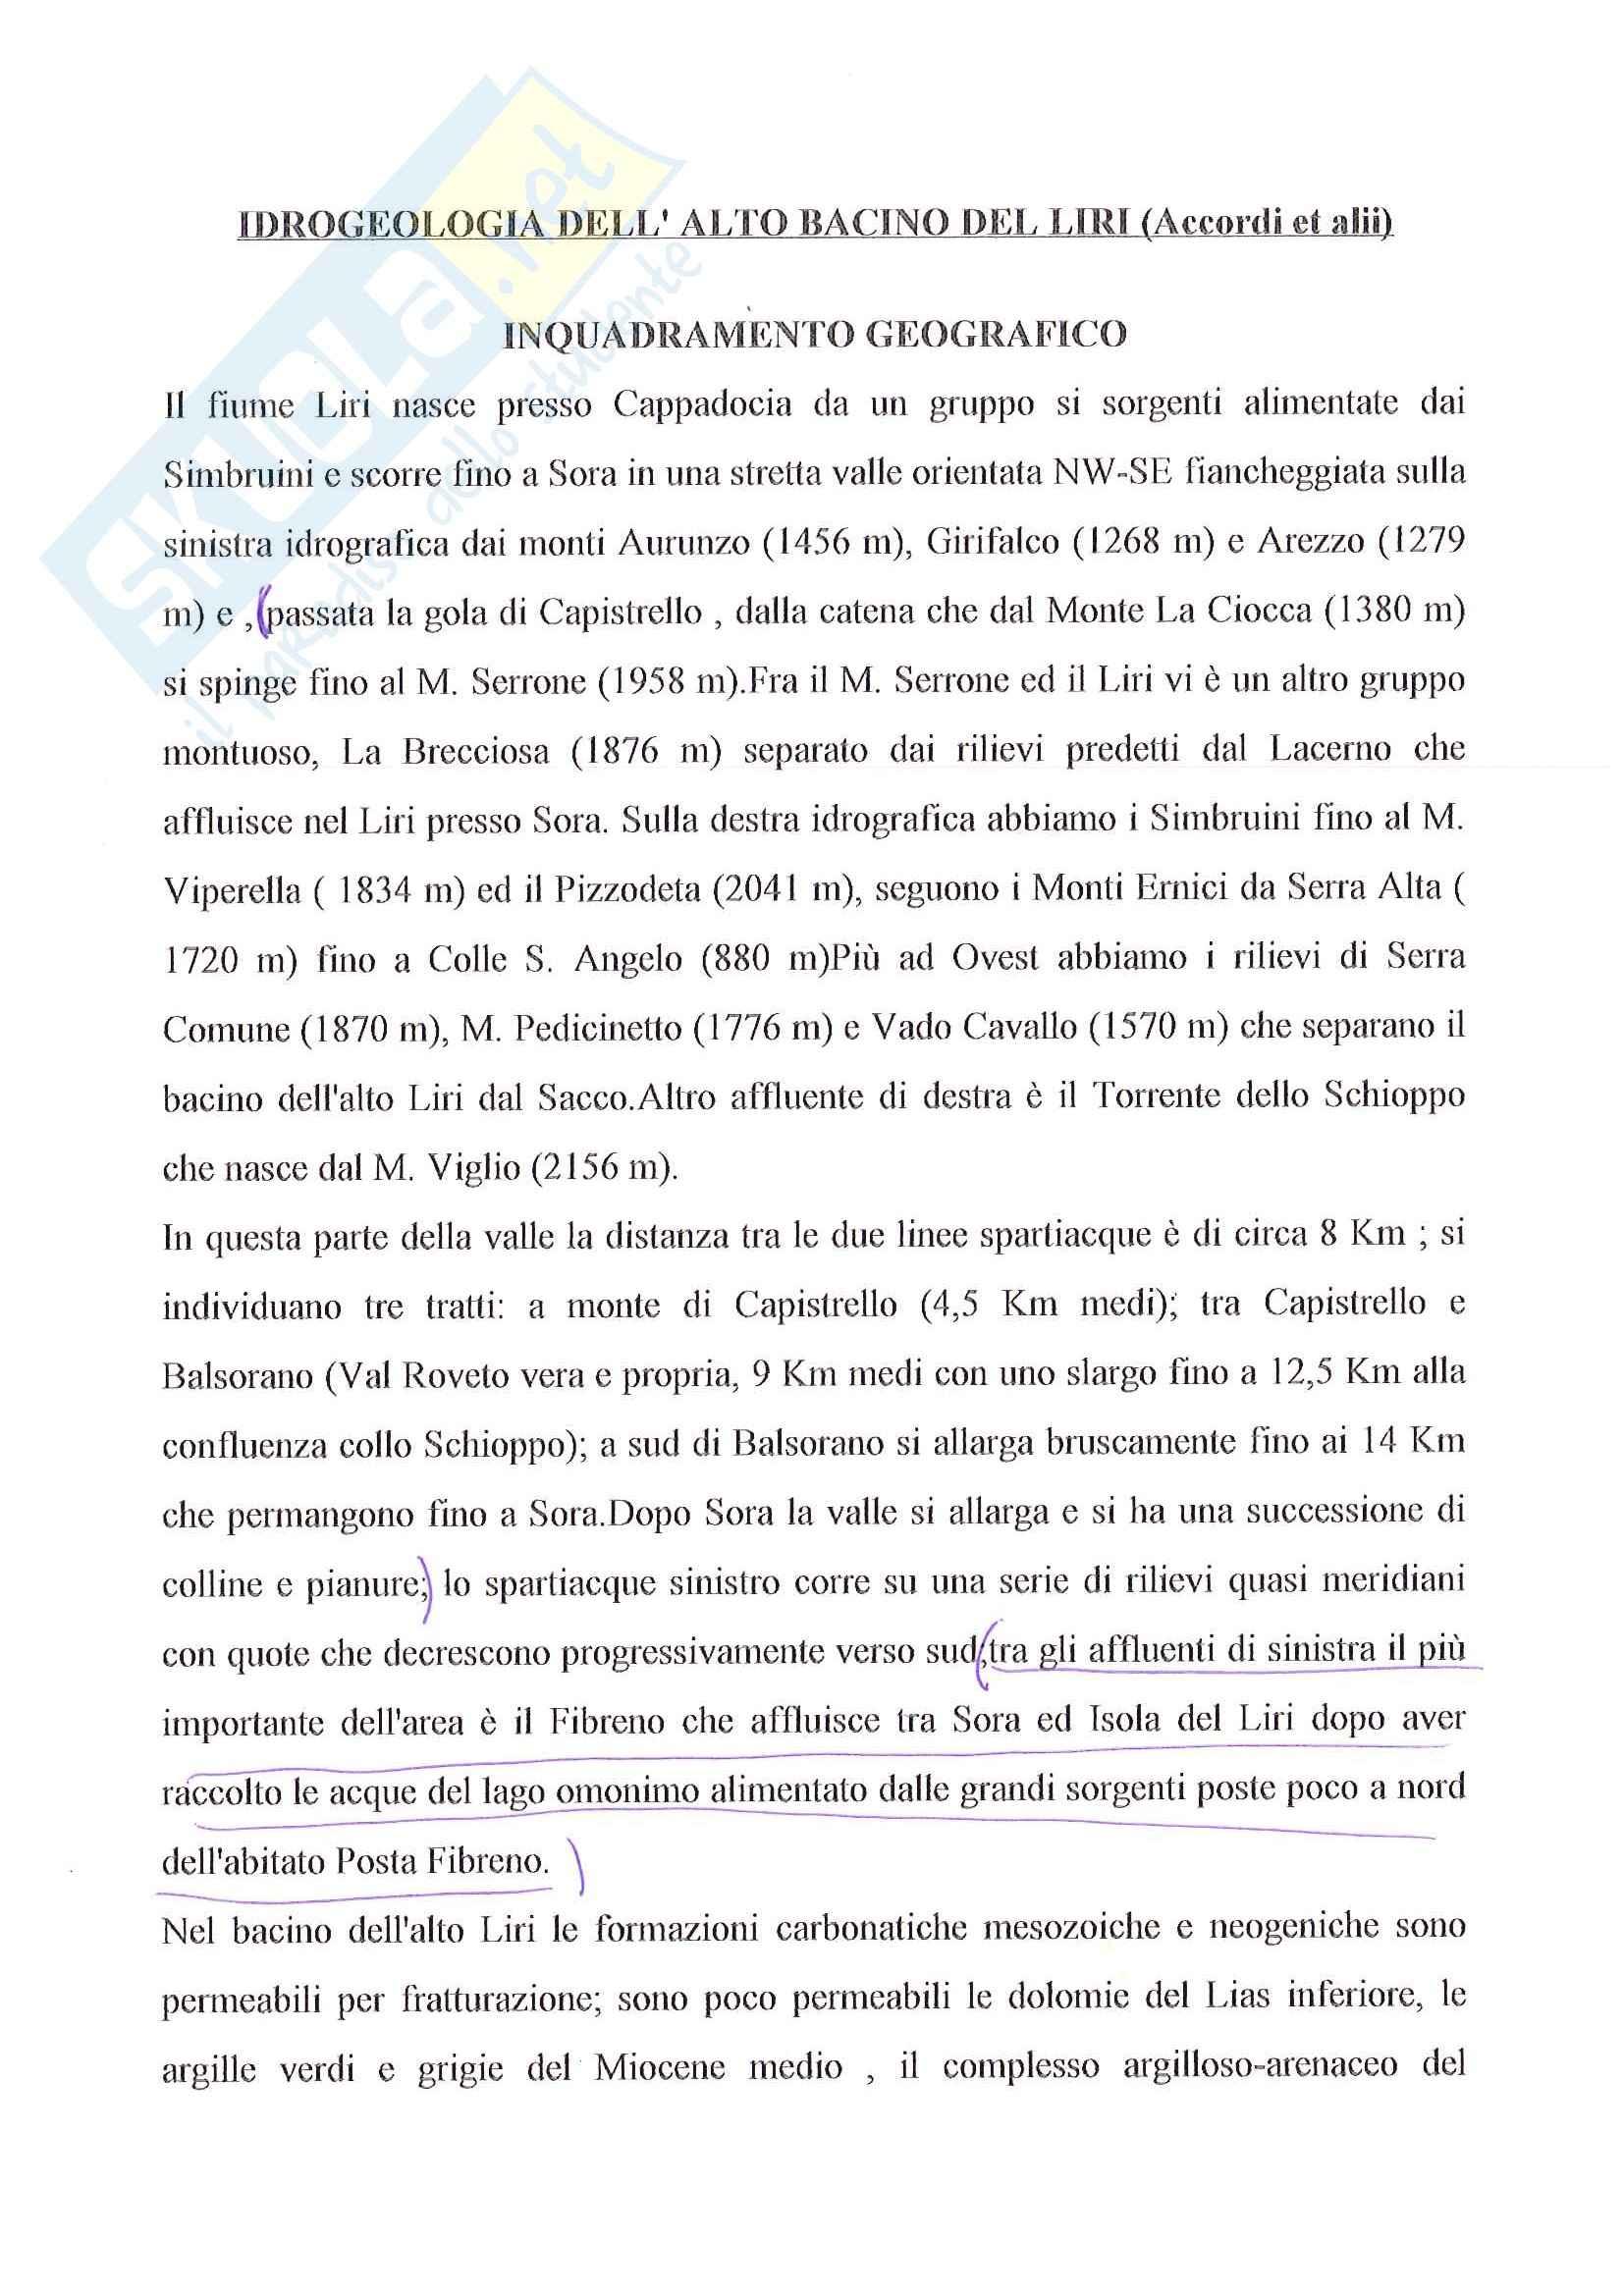 Riassunto esame Idrogeologia: Idrogeologia dell'Alto Bacino del Liri Accordi et Alii, prof. Petitta